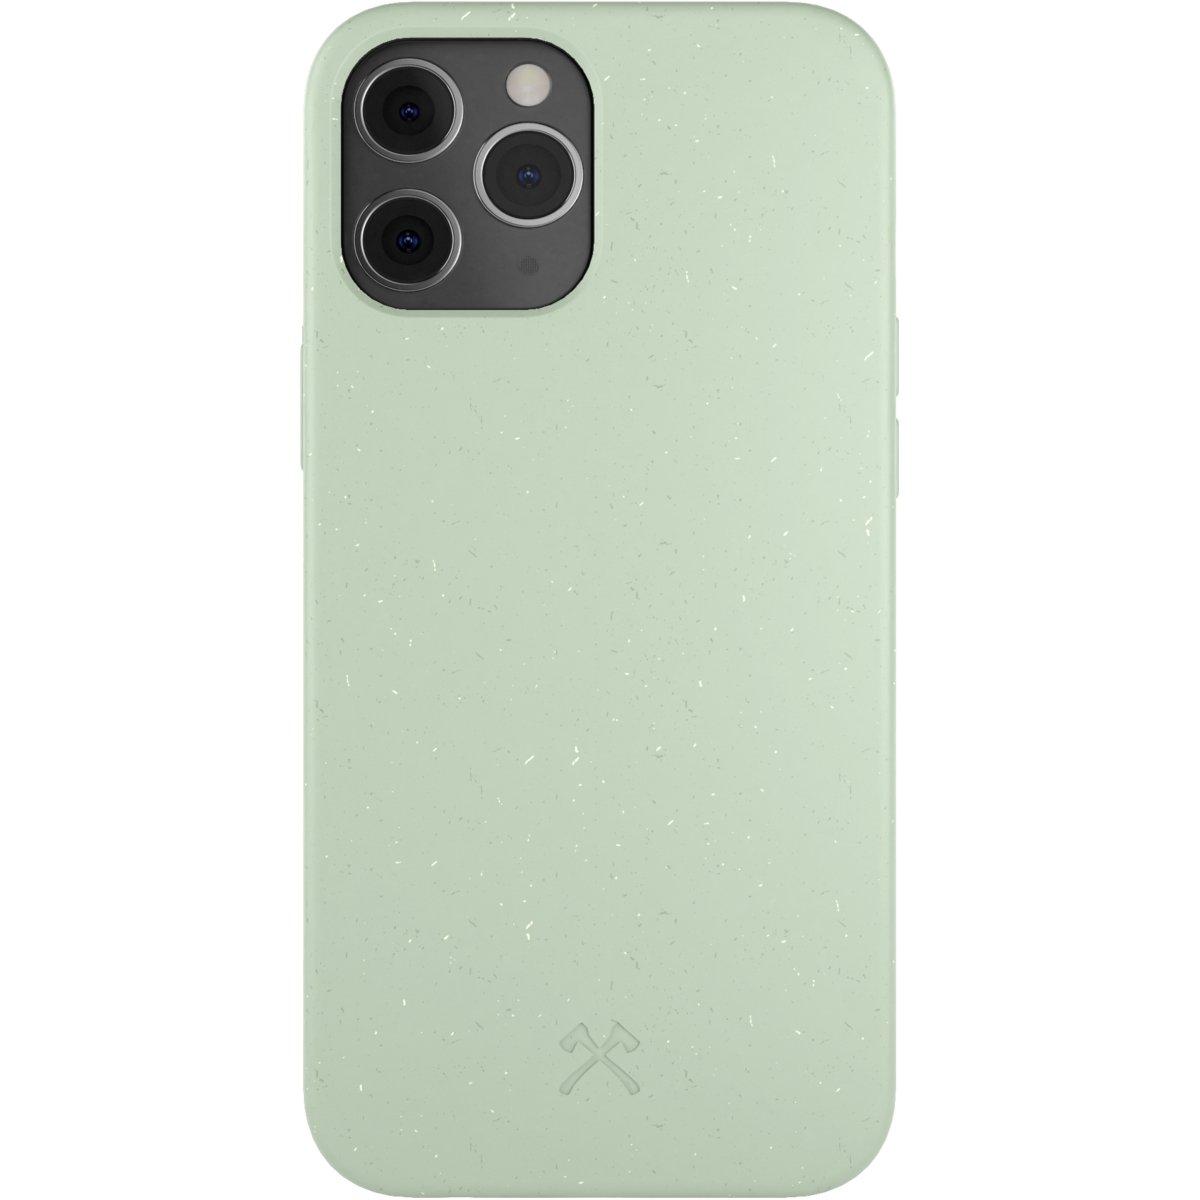 Woodcessories Bio Case AM iPhone 12 / 12 Pro - mint